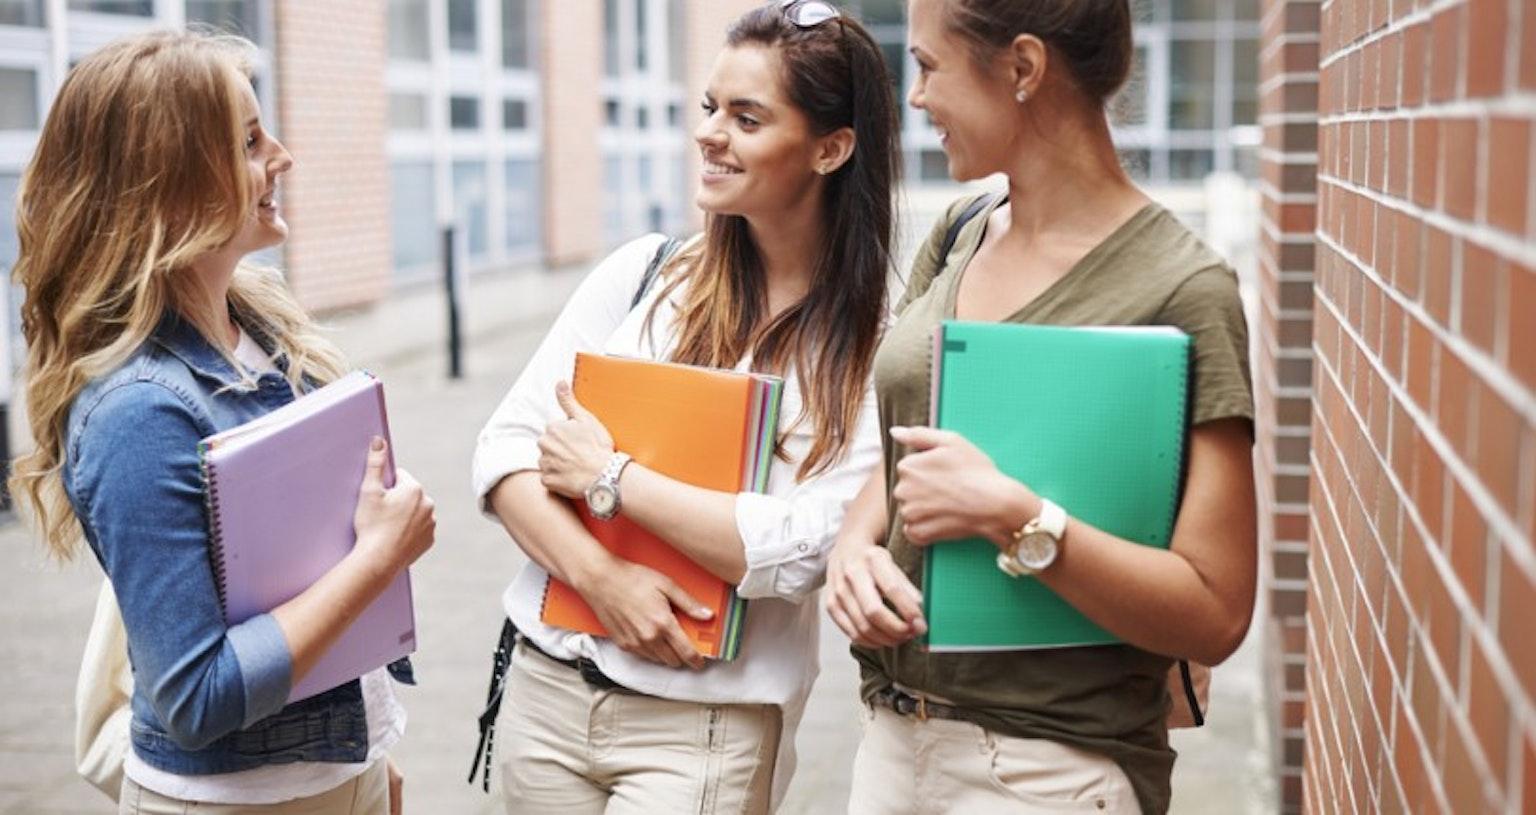 students smiling holding notebooks